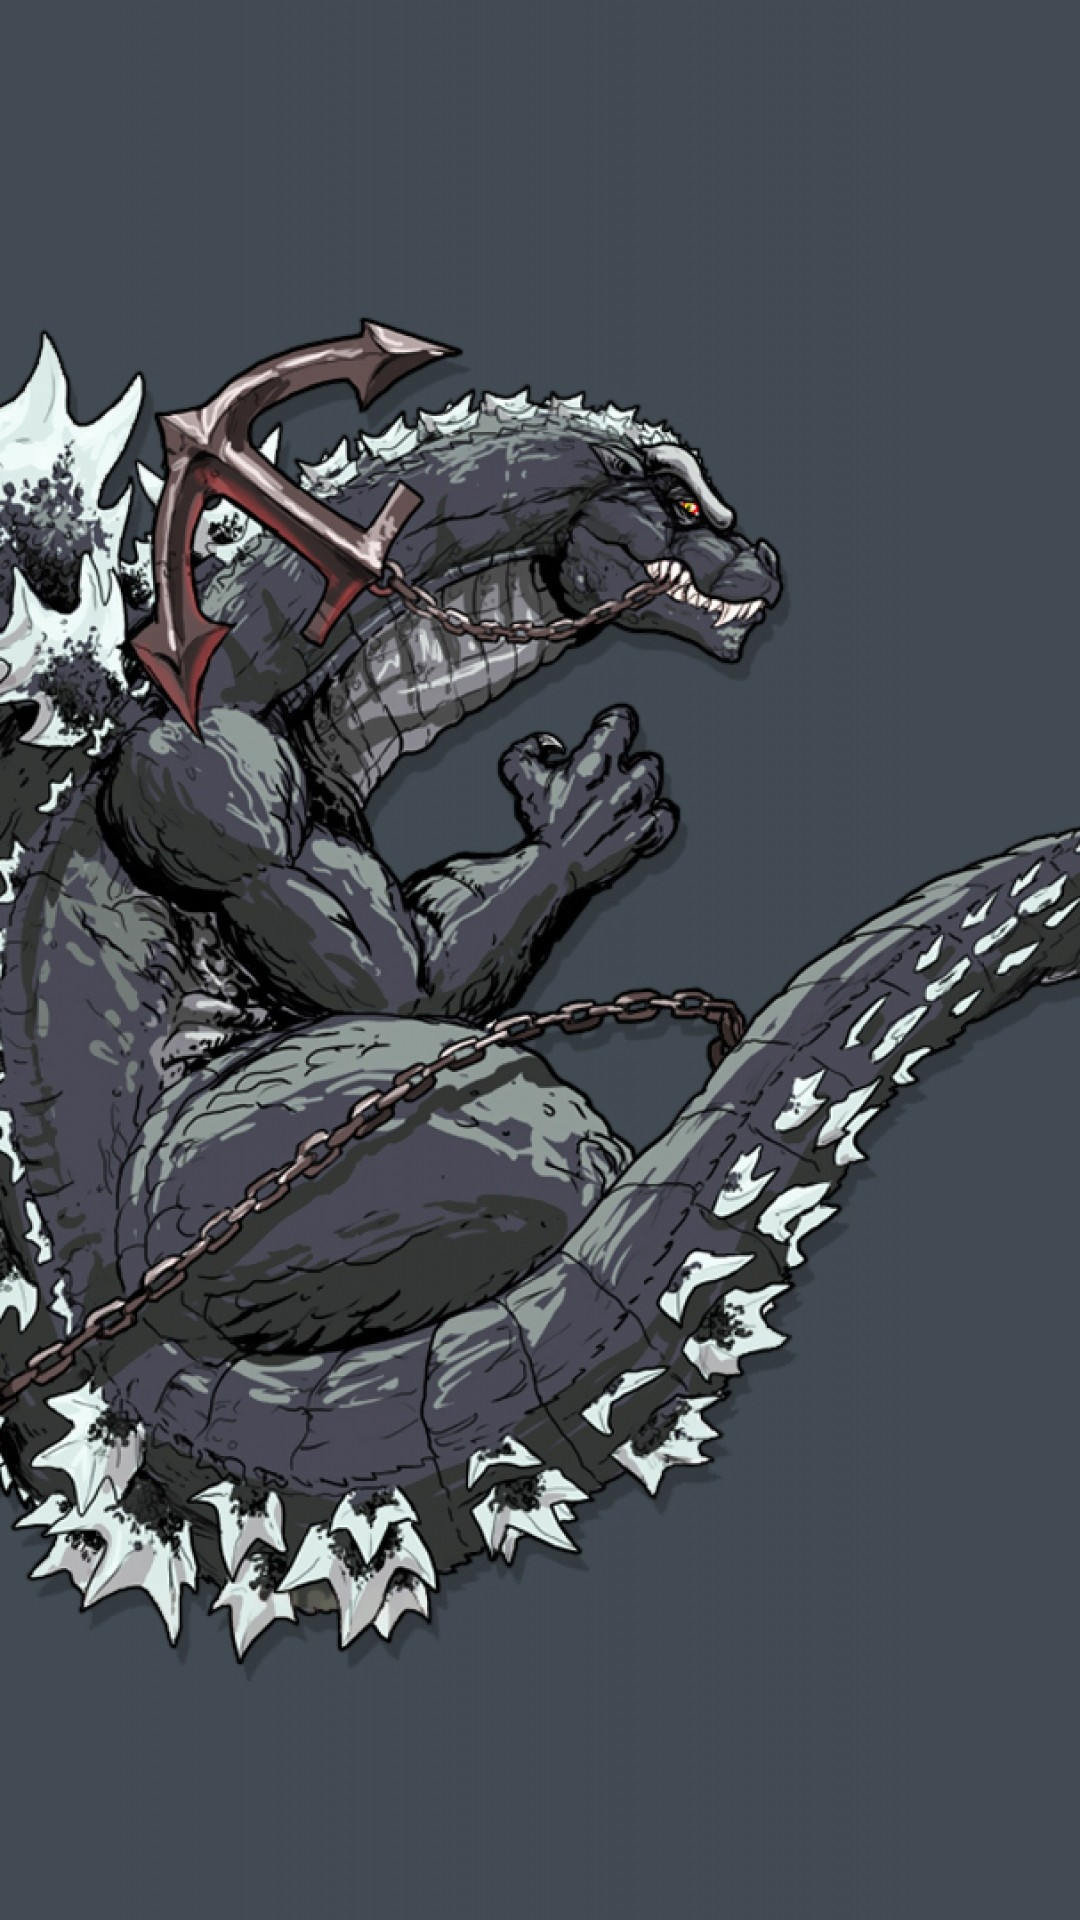 Preview wallpaper godzilla, monster, art, dinosaur, tail, anchor 1080×1920